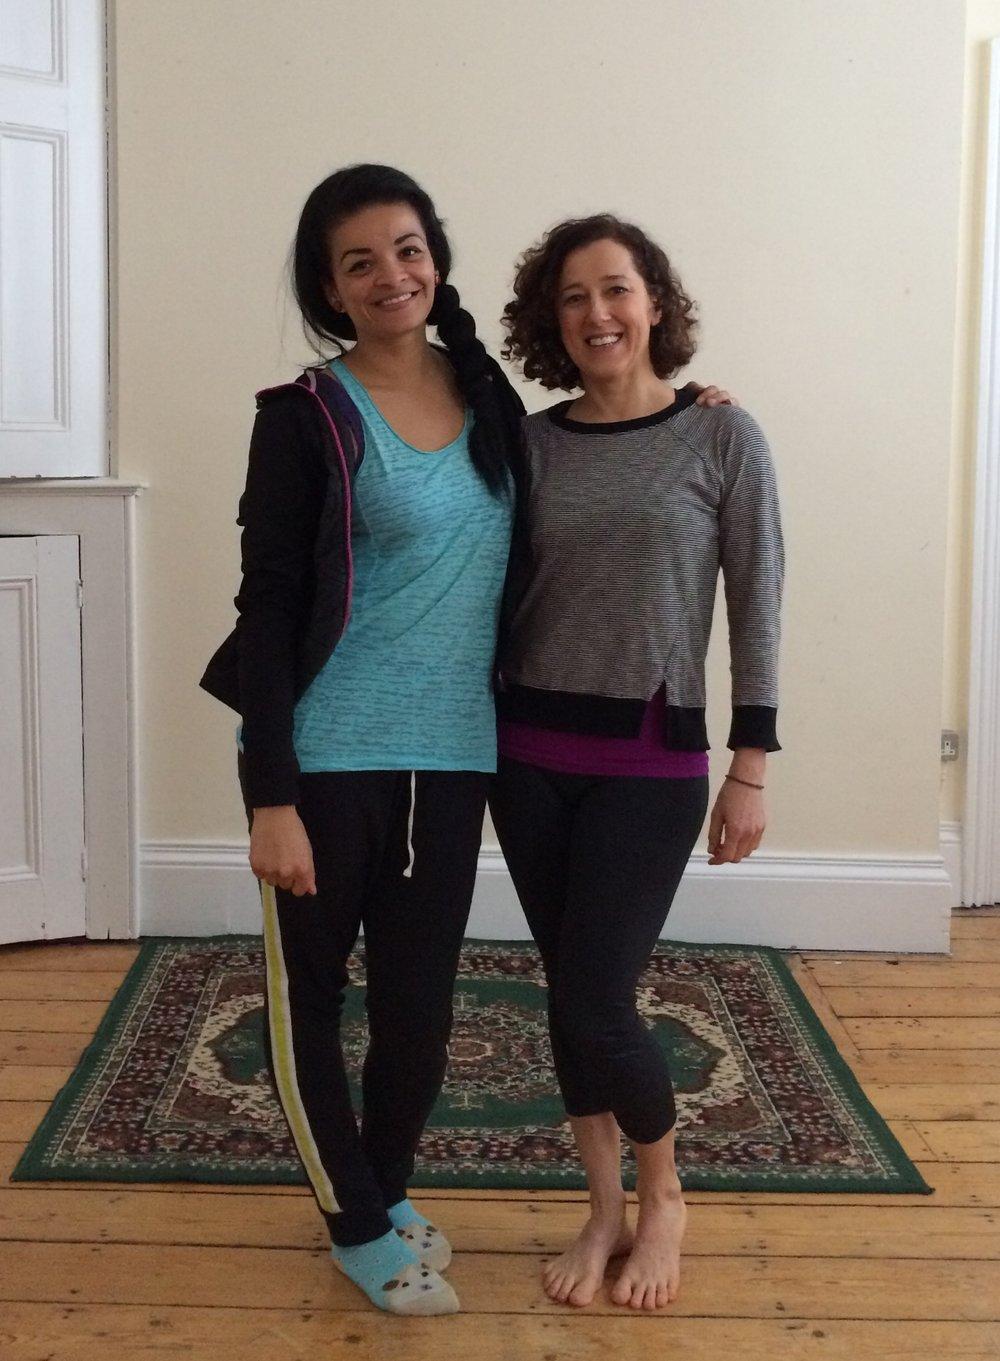 Natalie  @zumbanatalieuk and Rachel @onbeing_adopted